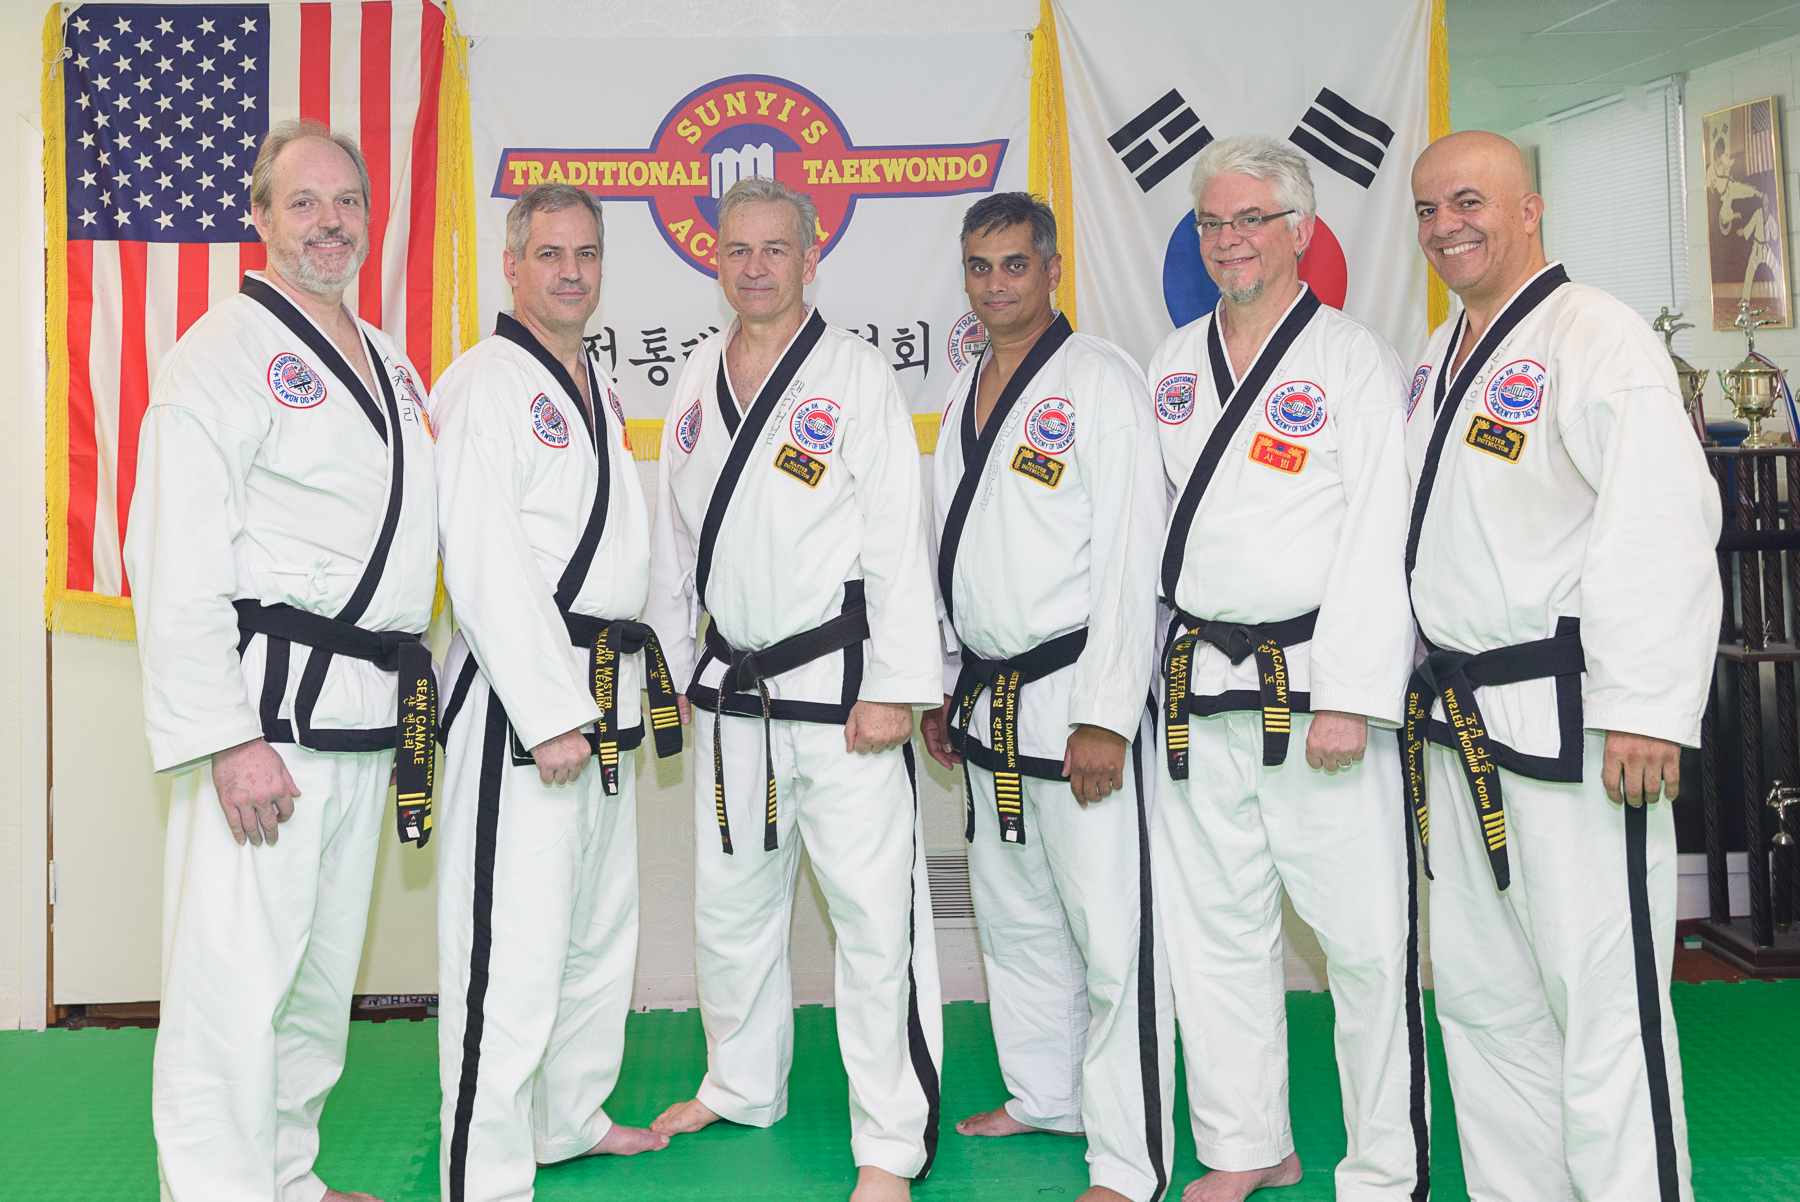 Sun Yi's Instructors, North Carolina